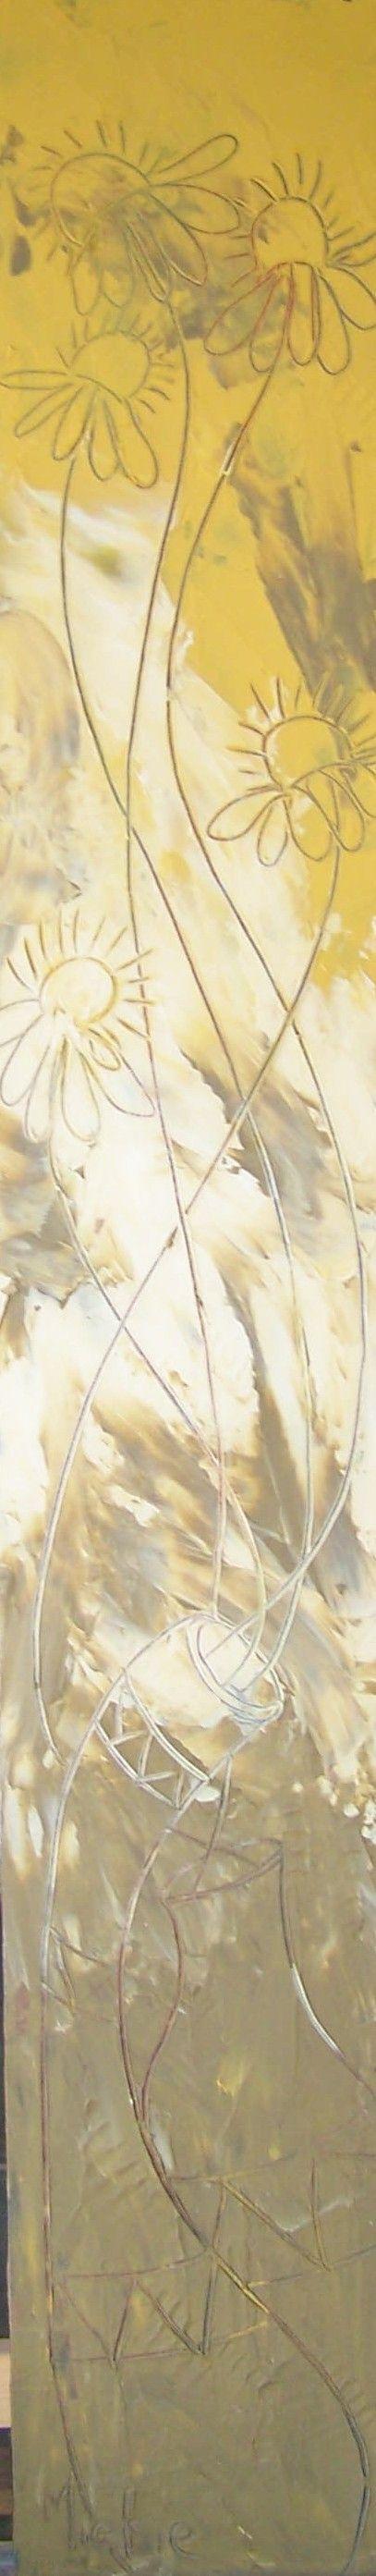 Potted beauties. Sgraffito flowers. Acrylic on masonite. 145.5 cm x 22 cm (1,5 m x 0,22 m). R500 unframed.